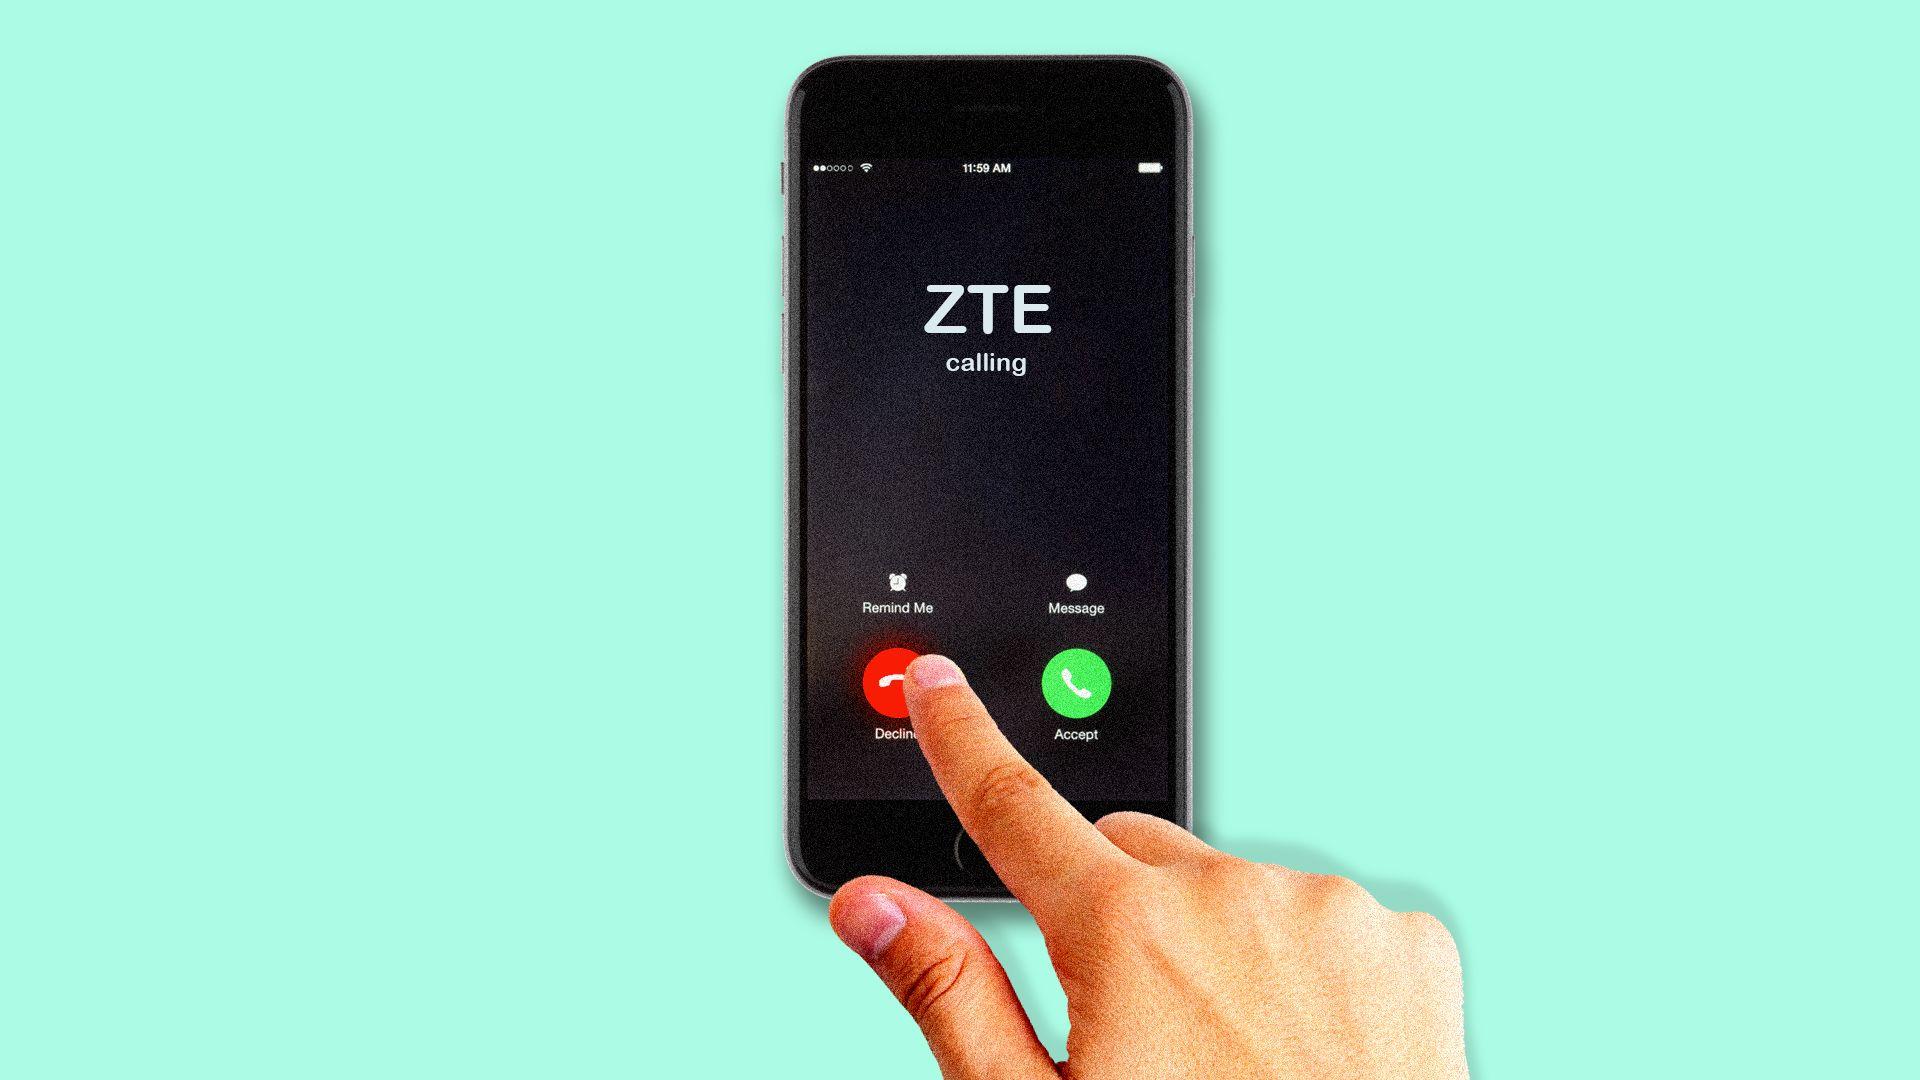 Artistic interpretation of someone refusing a call from ZTE